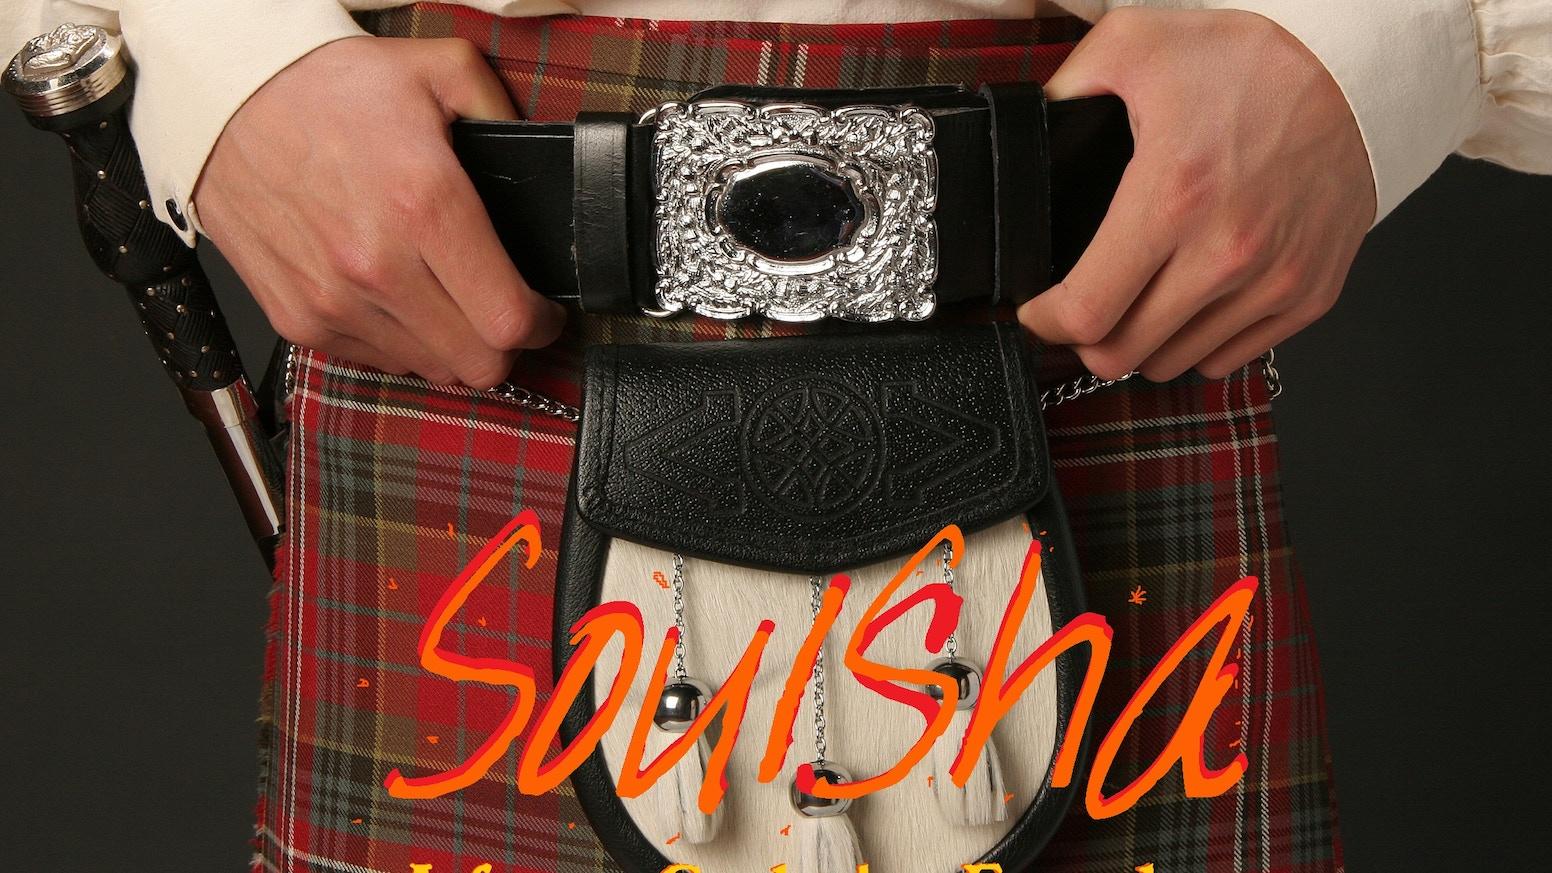 Launch Soulsha Afro-Celtic Funk Band! by Neil Pearlman » FAQ